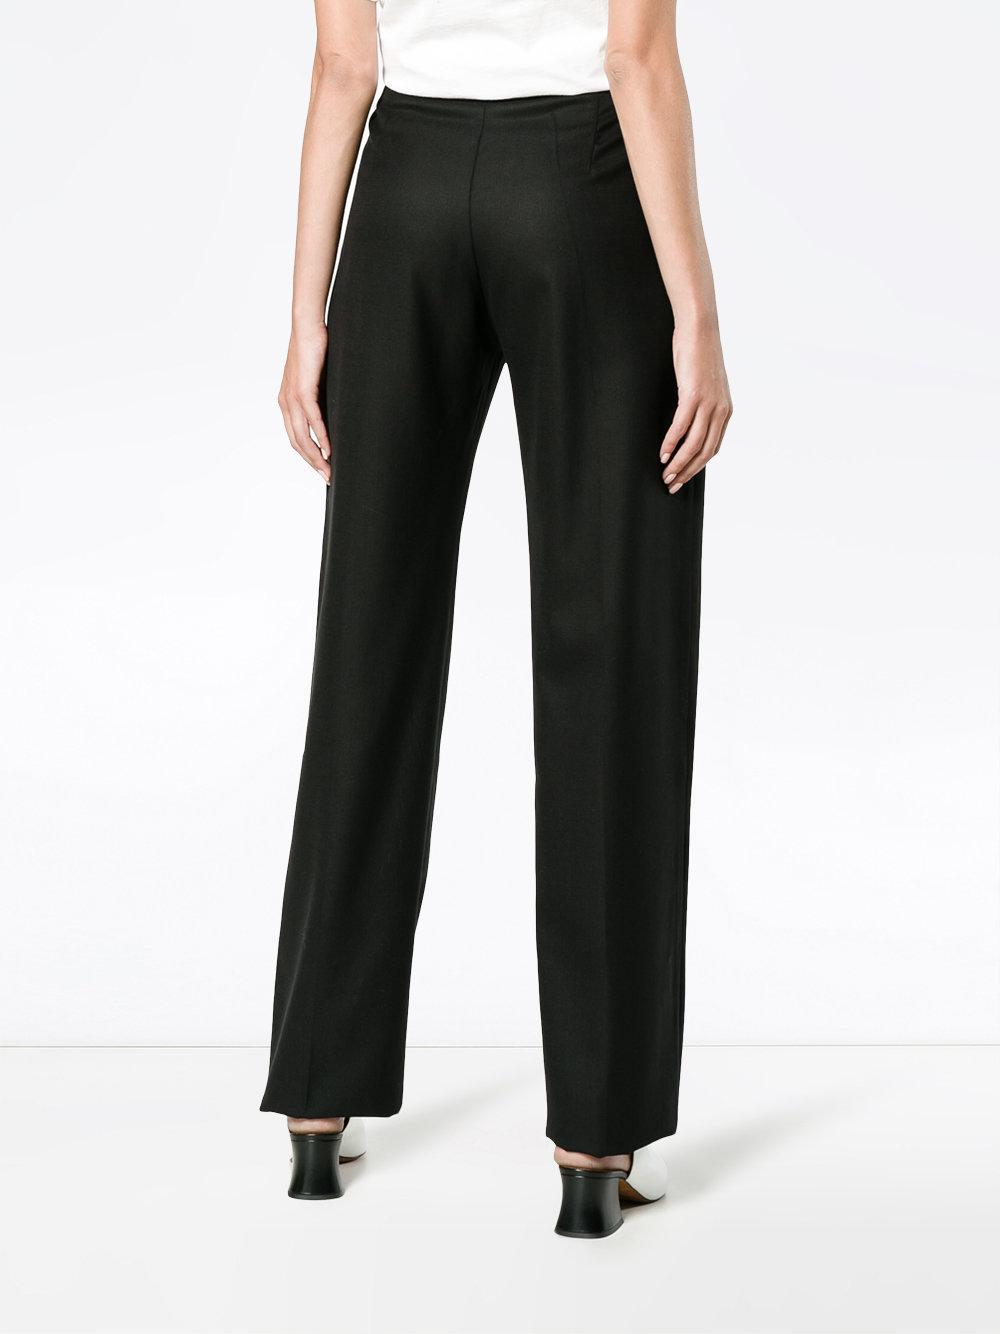 lyst jacquemus le pantalon taille haute trousers in black. Black Bedroom Furniture Sets. Home Design Ideas